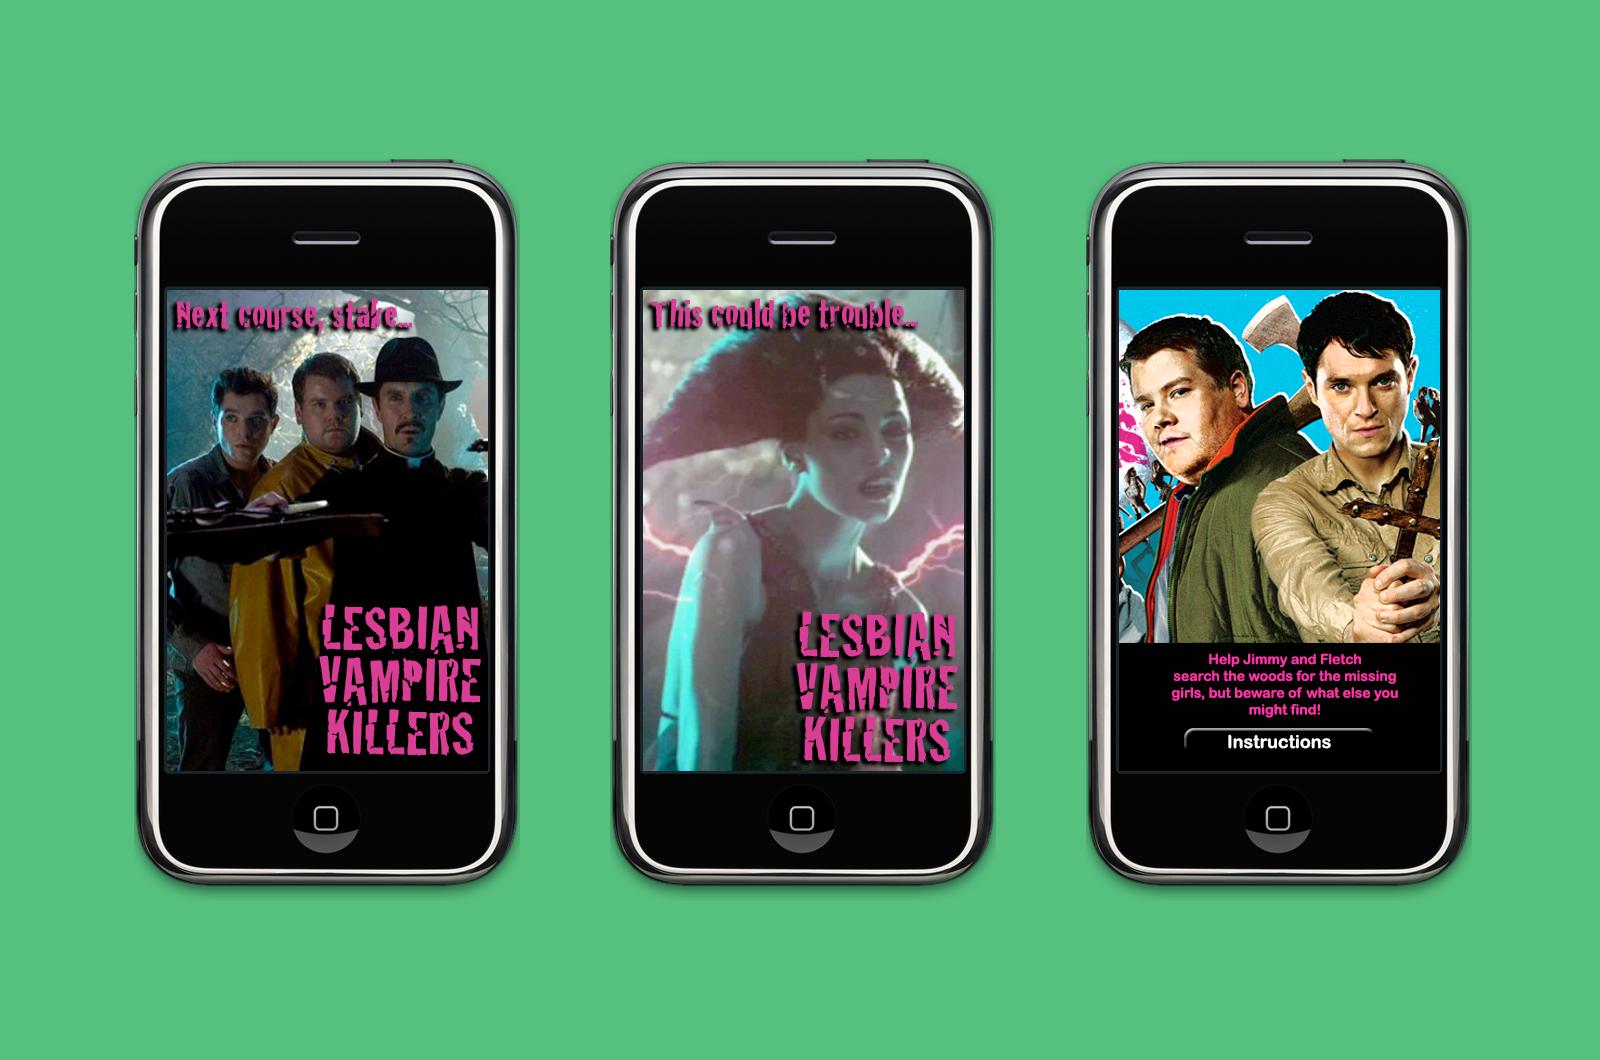 Lesbian Vampire Killers app screens